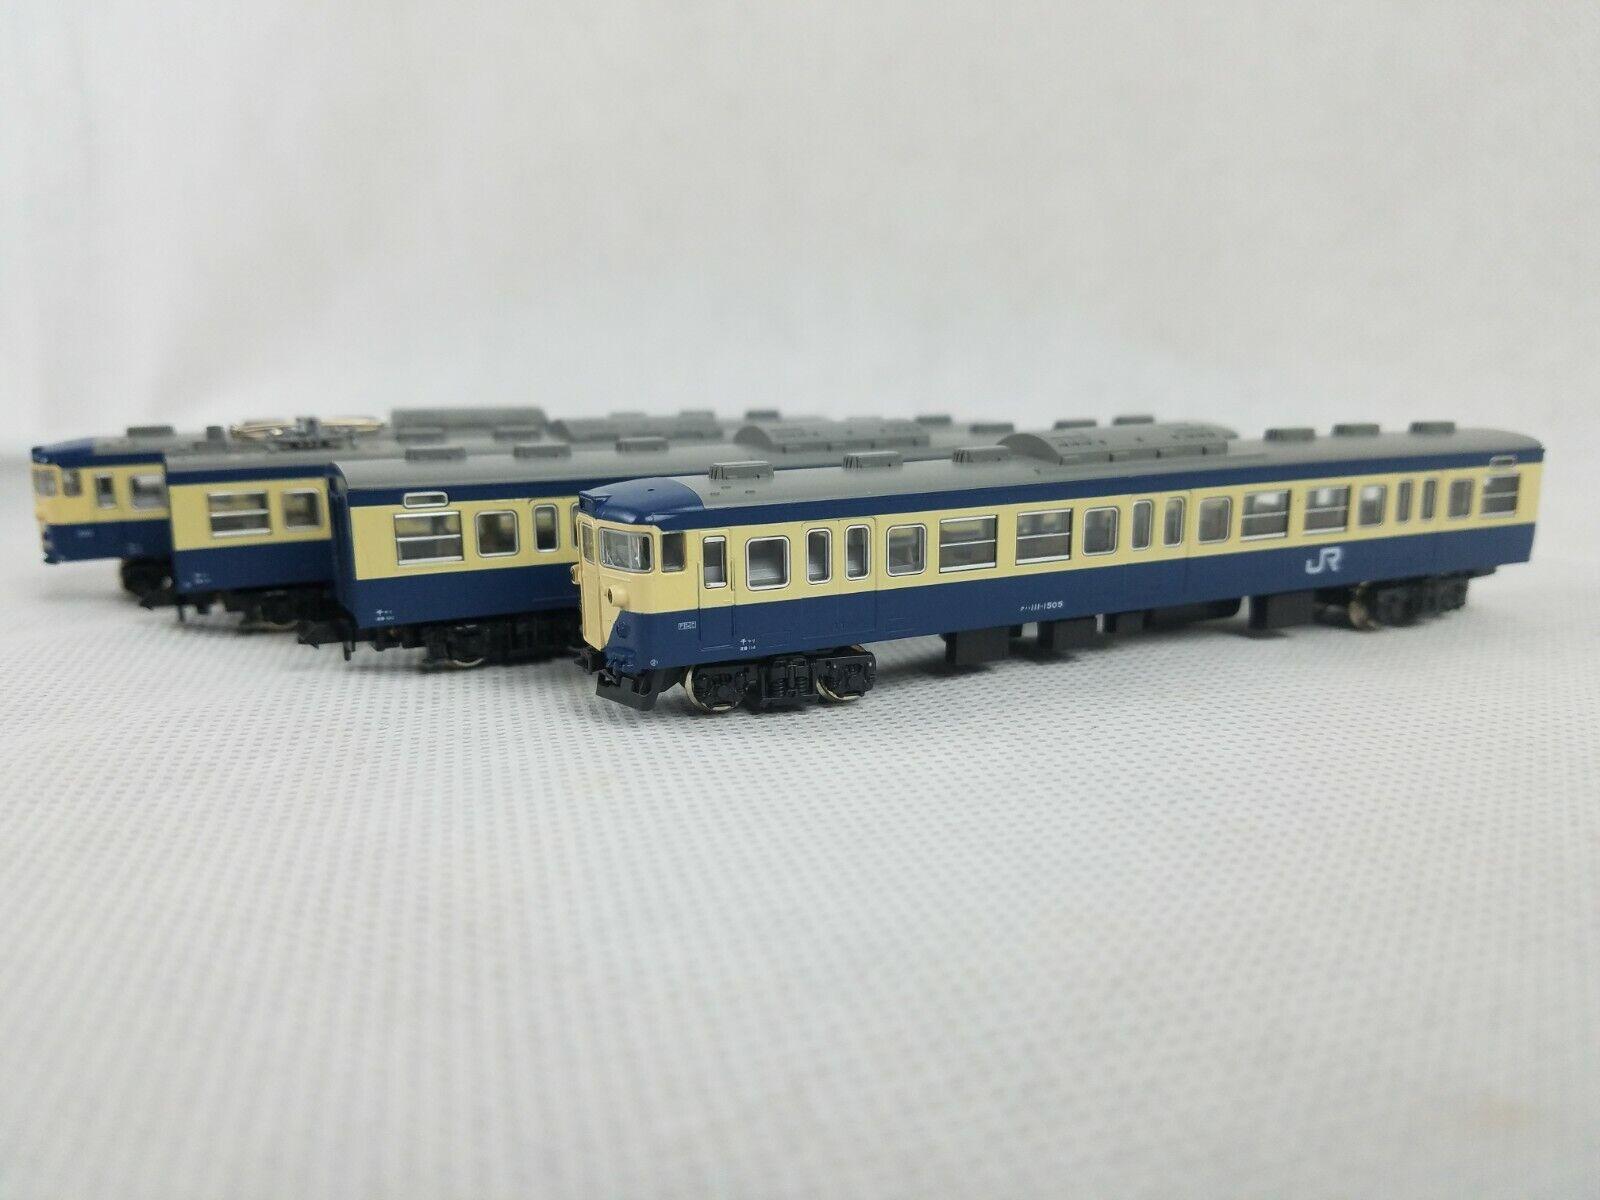 N Scale Kato 10-197 113-1500 Series (Yokosuka Line Line Line color) 4 Car Train Set d8952b